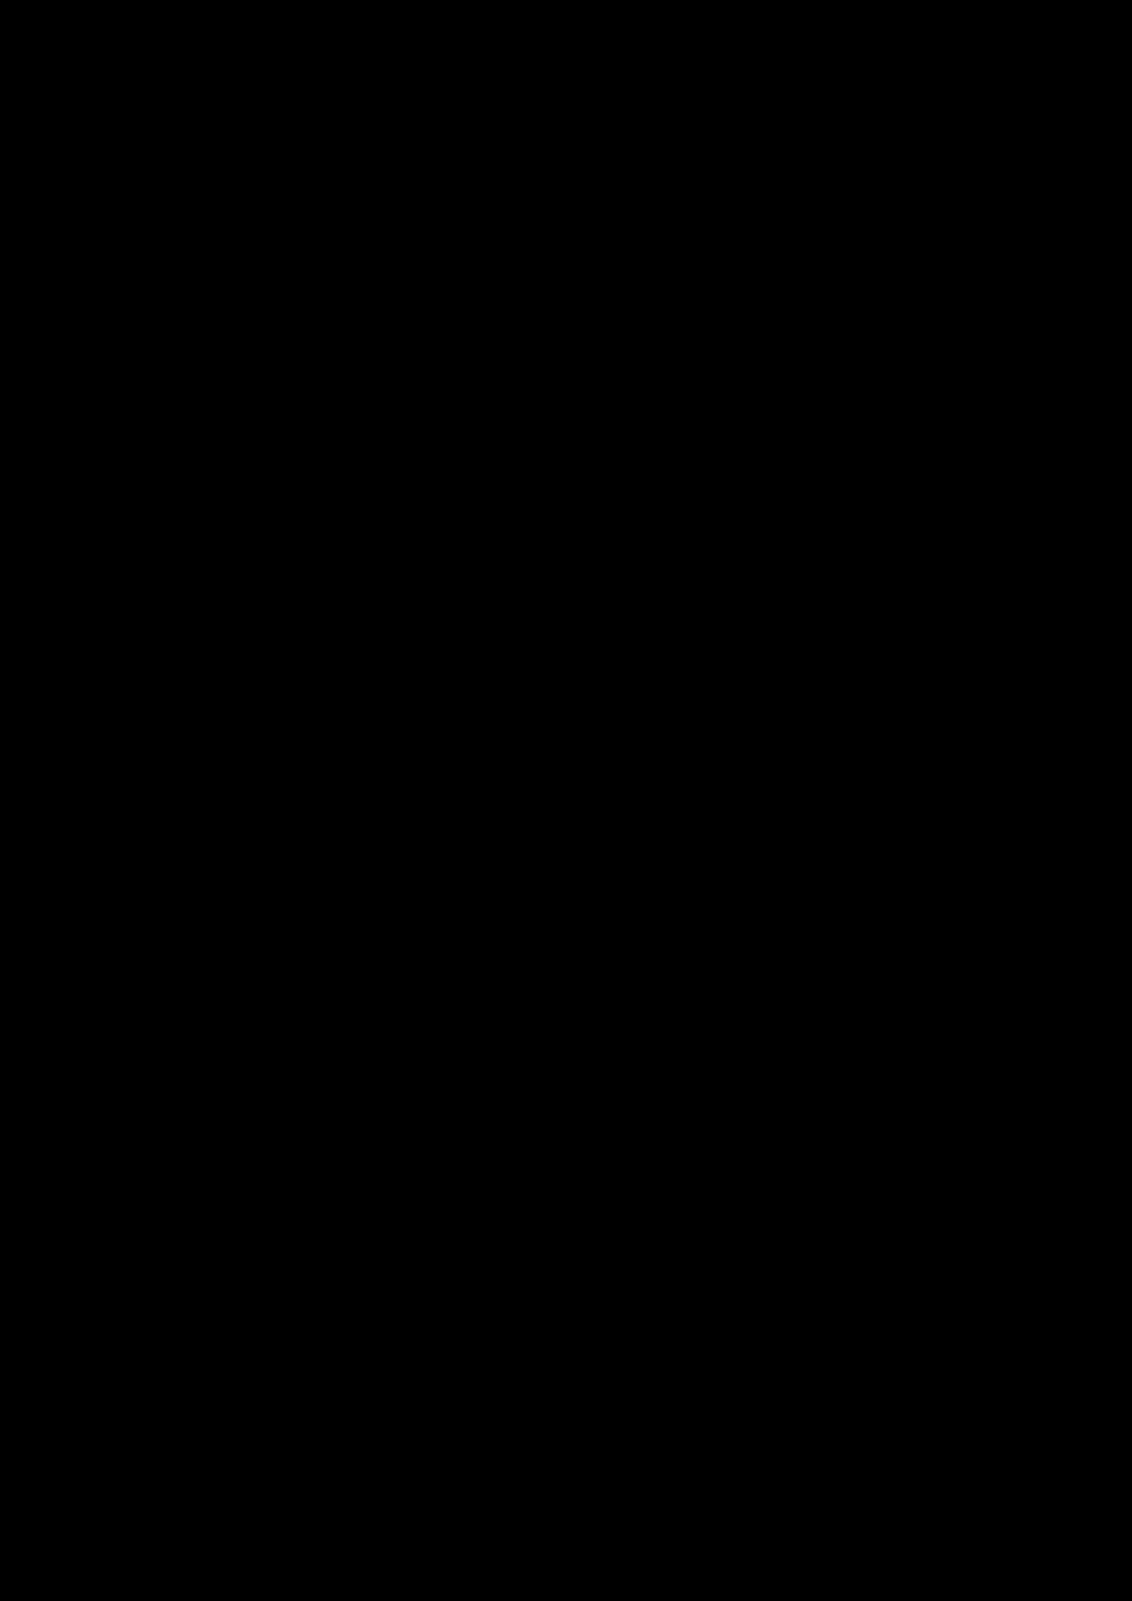 Prosti slide, Image 46